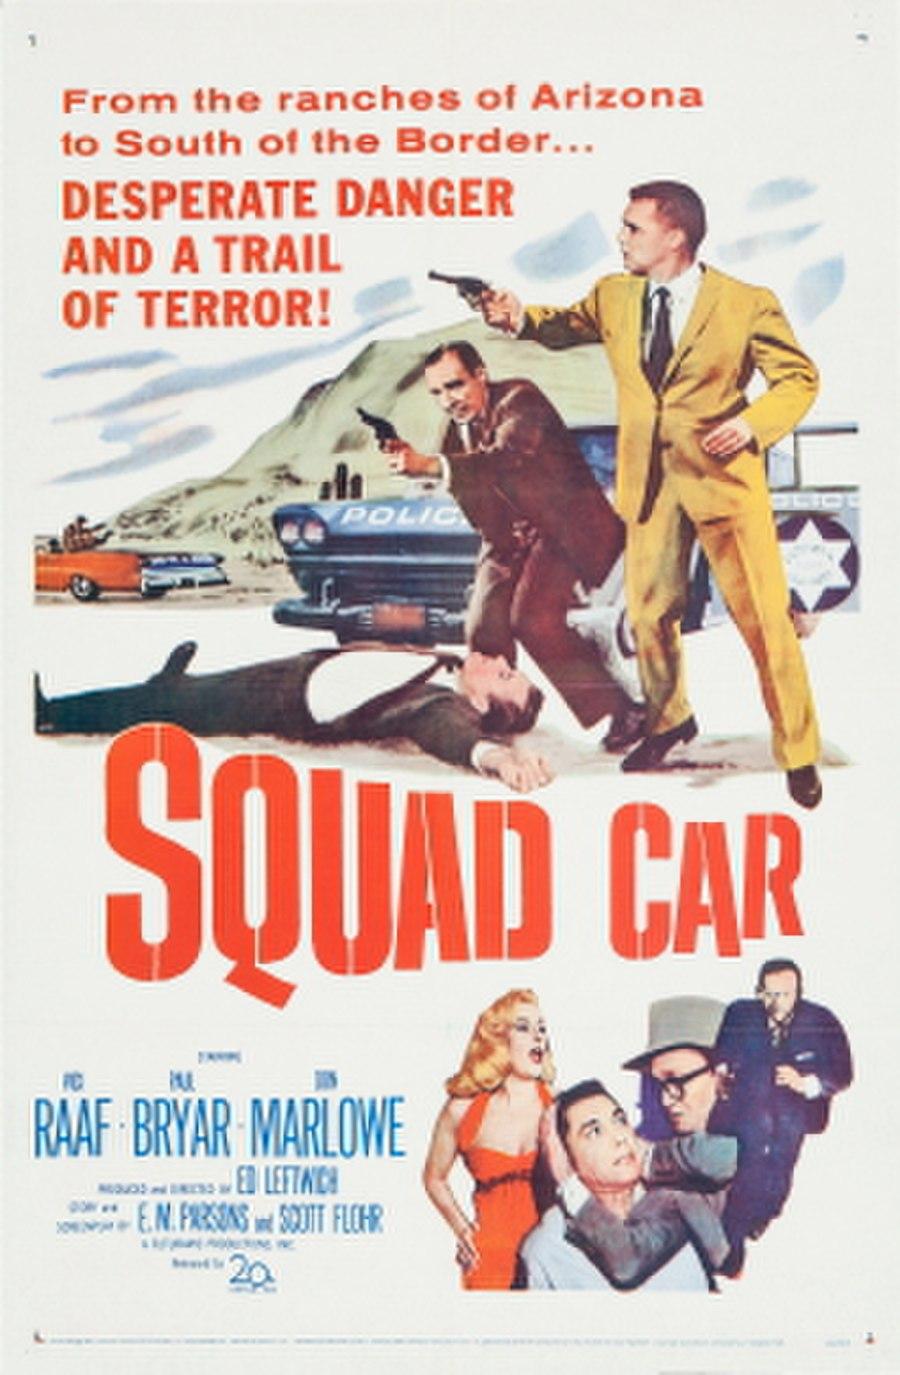 Squad Car